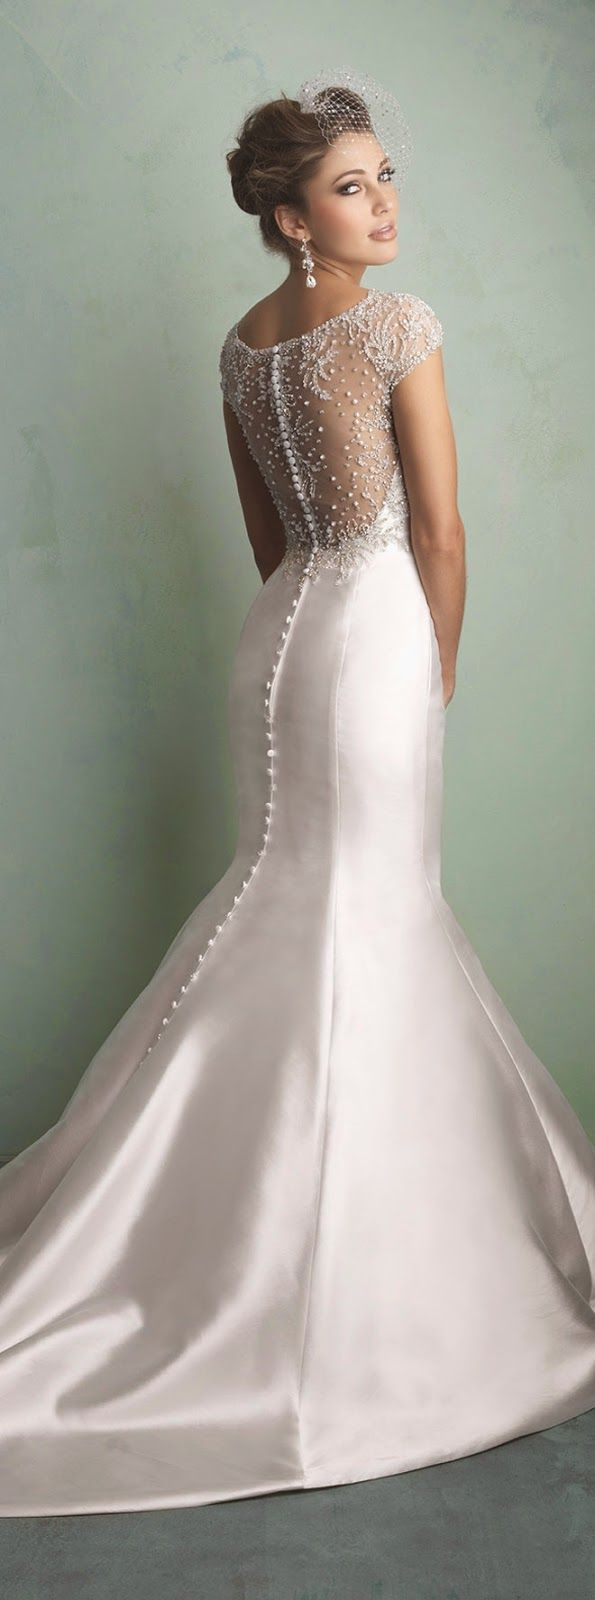 beautiful perfect dress for women - inspiration (288)